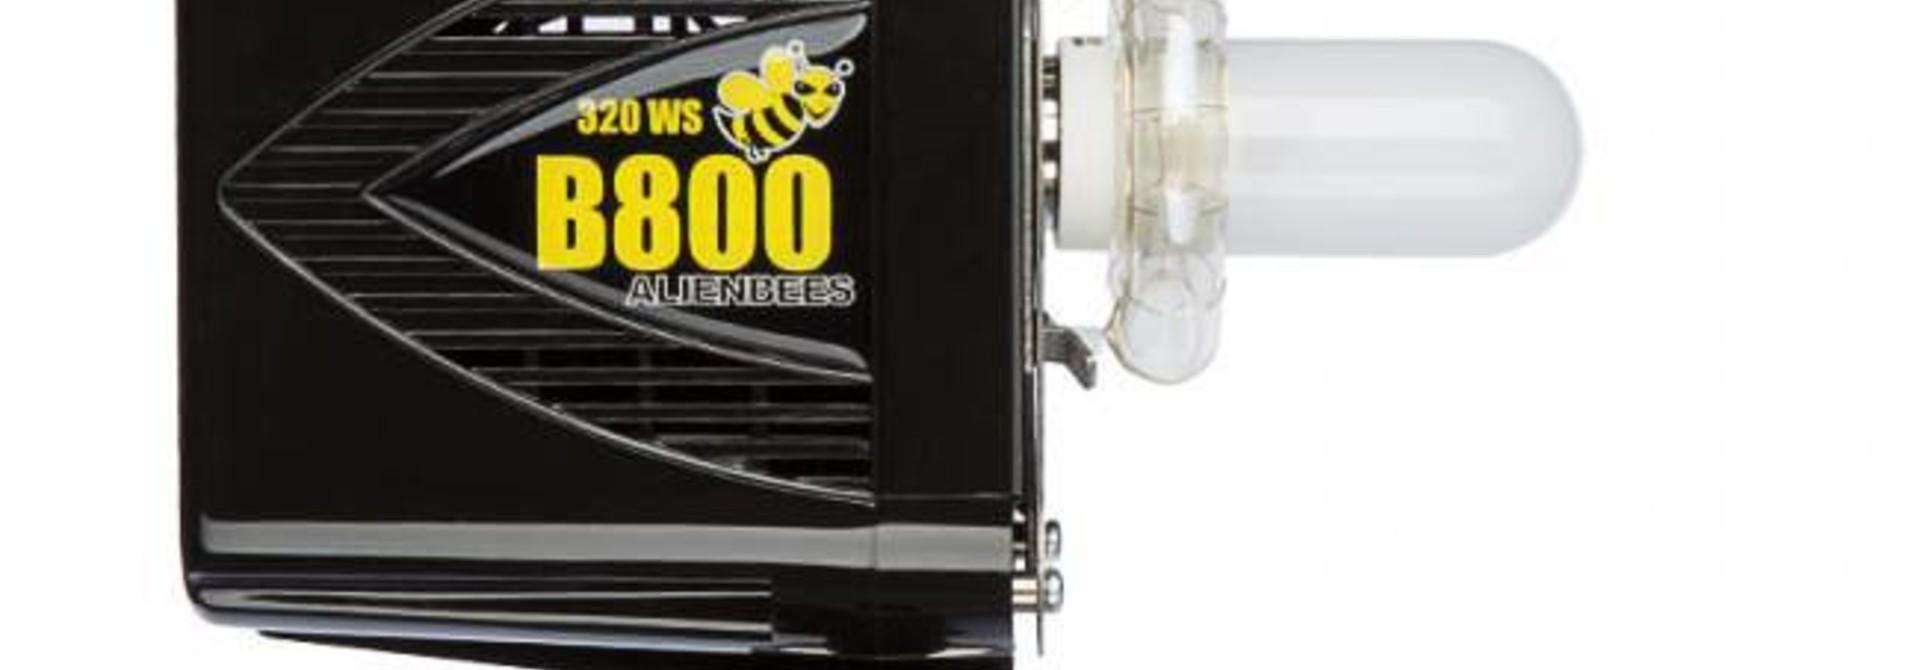 AlienBees Flash Unit B800